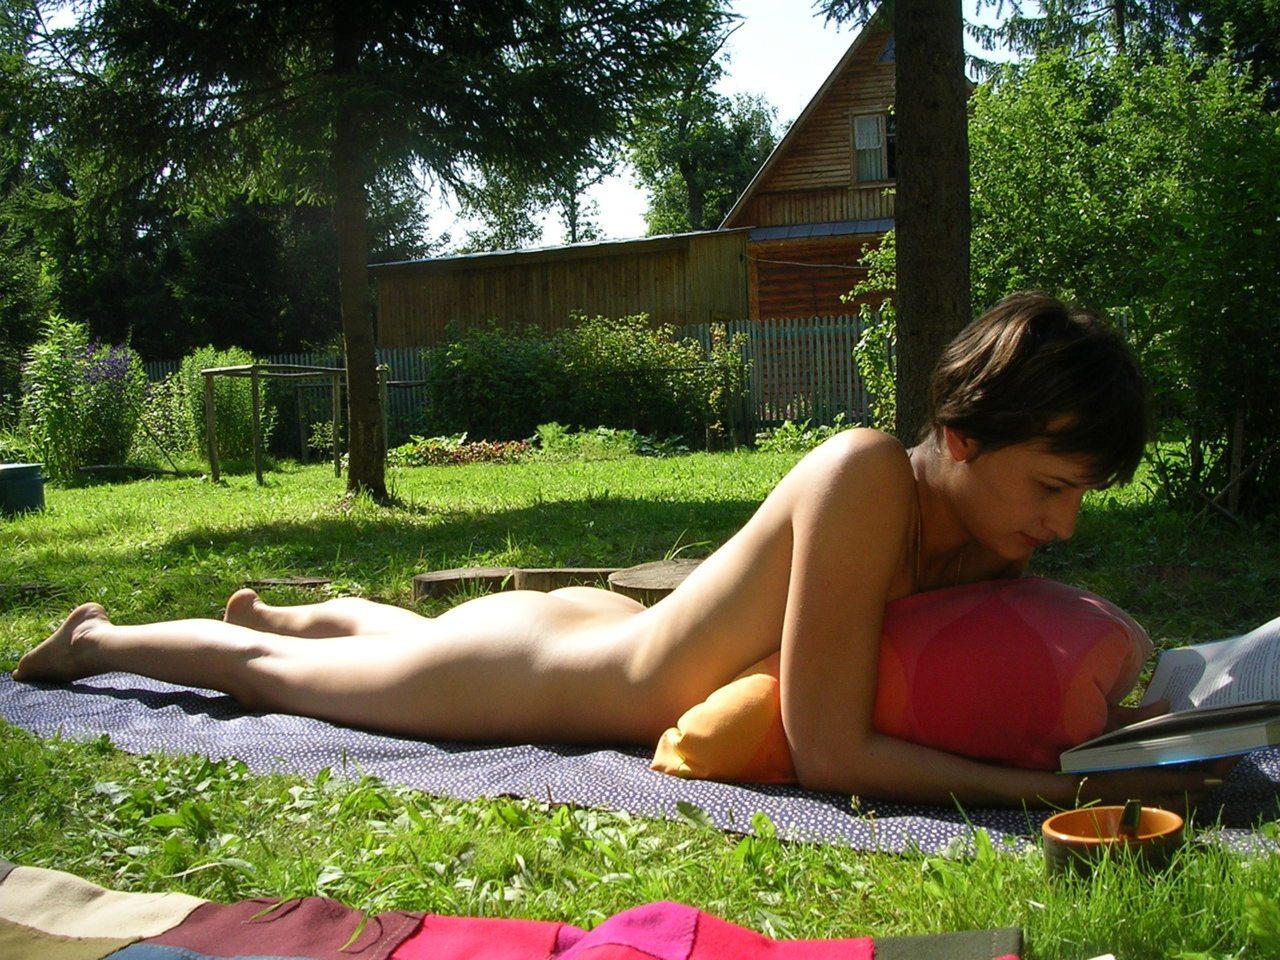 nudism teen girl